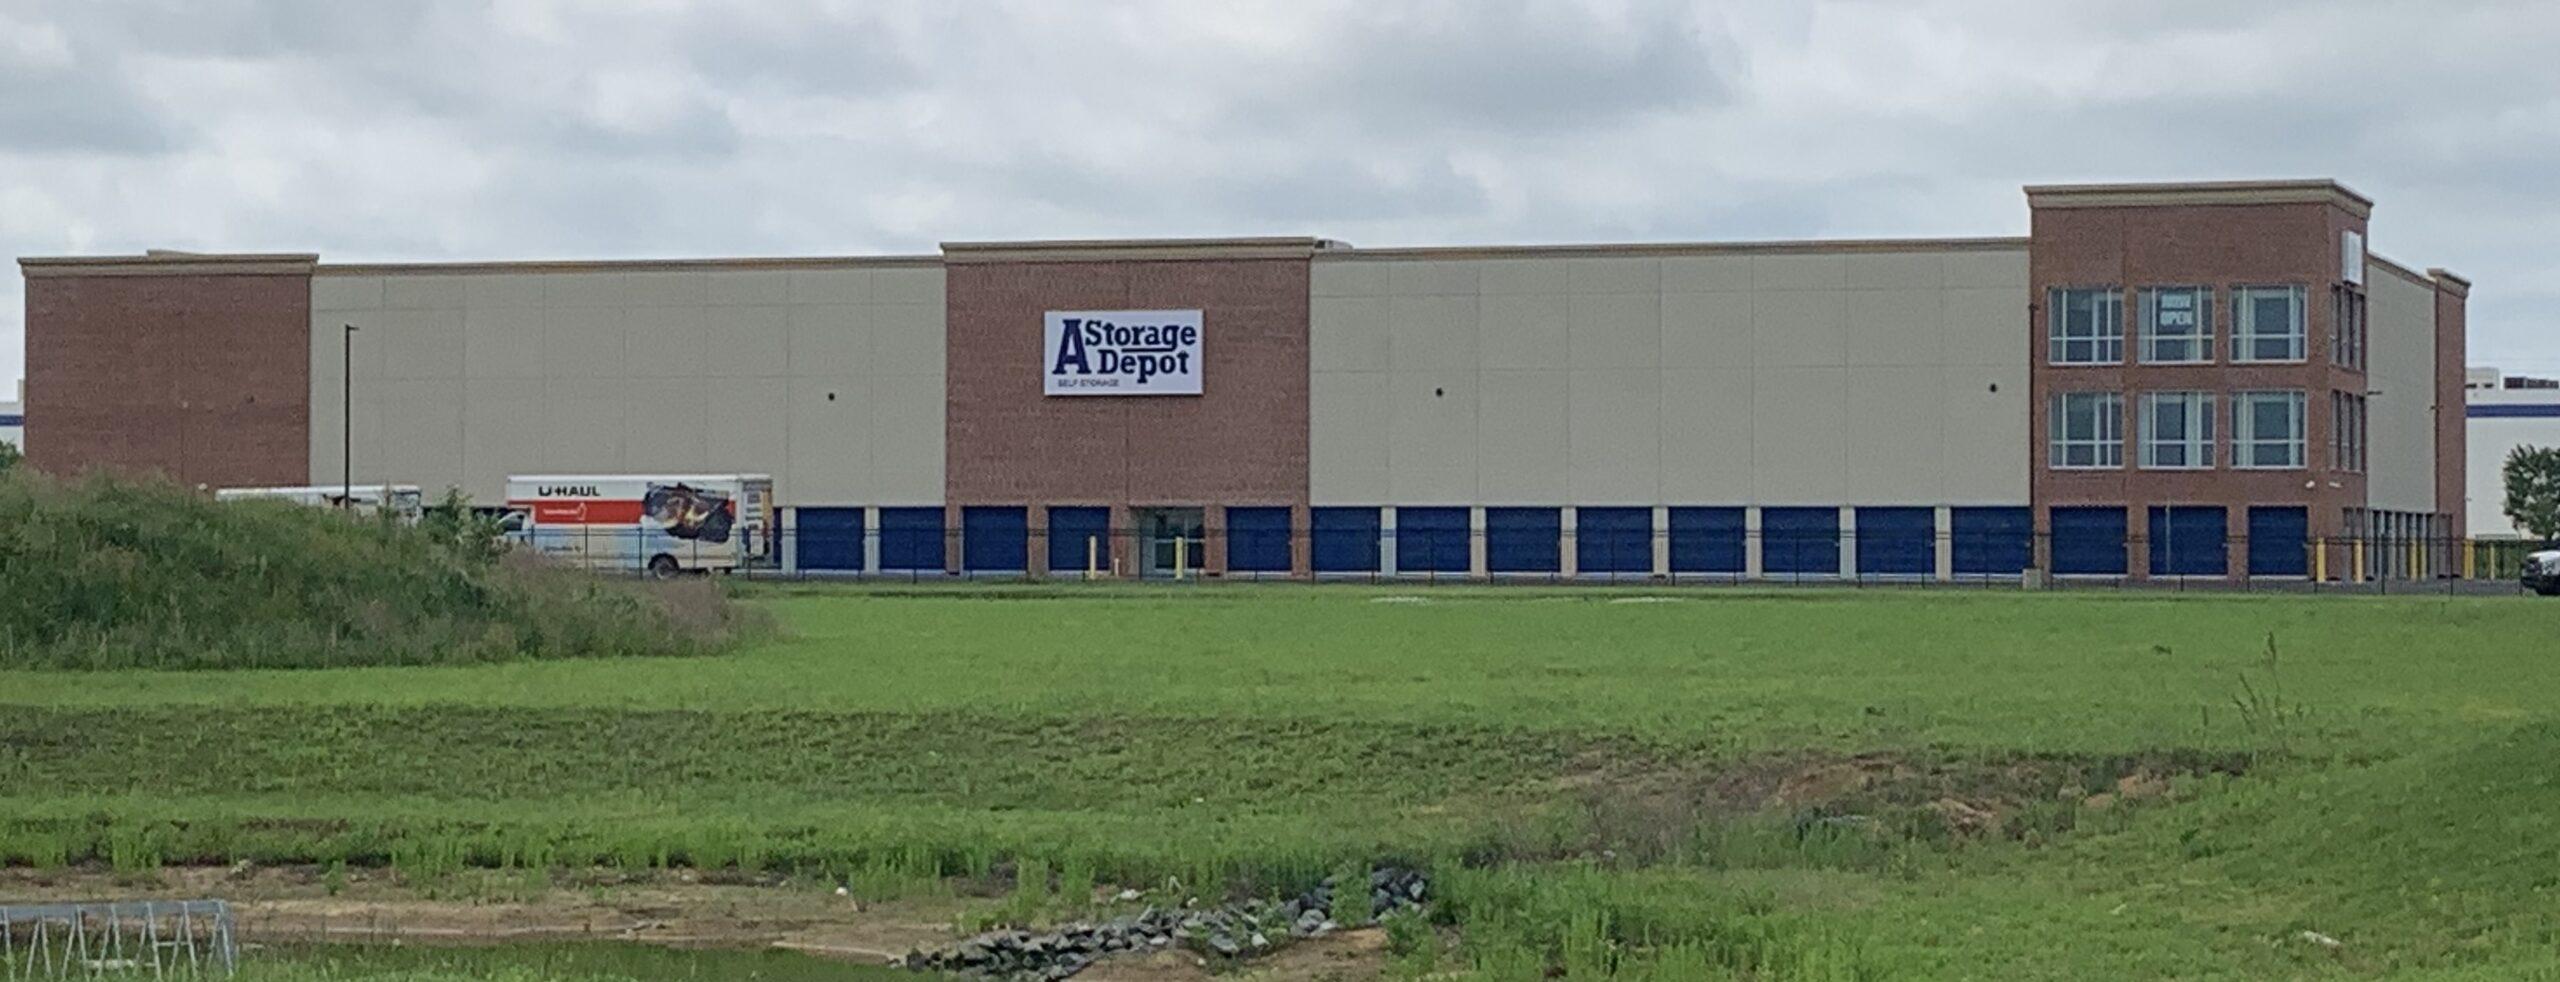 A Storage Depot – Middletown, DE